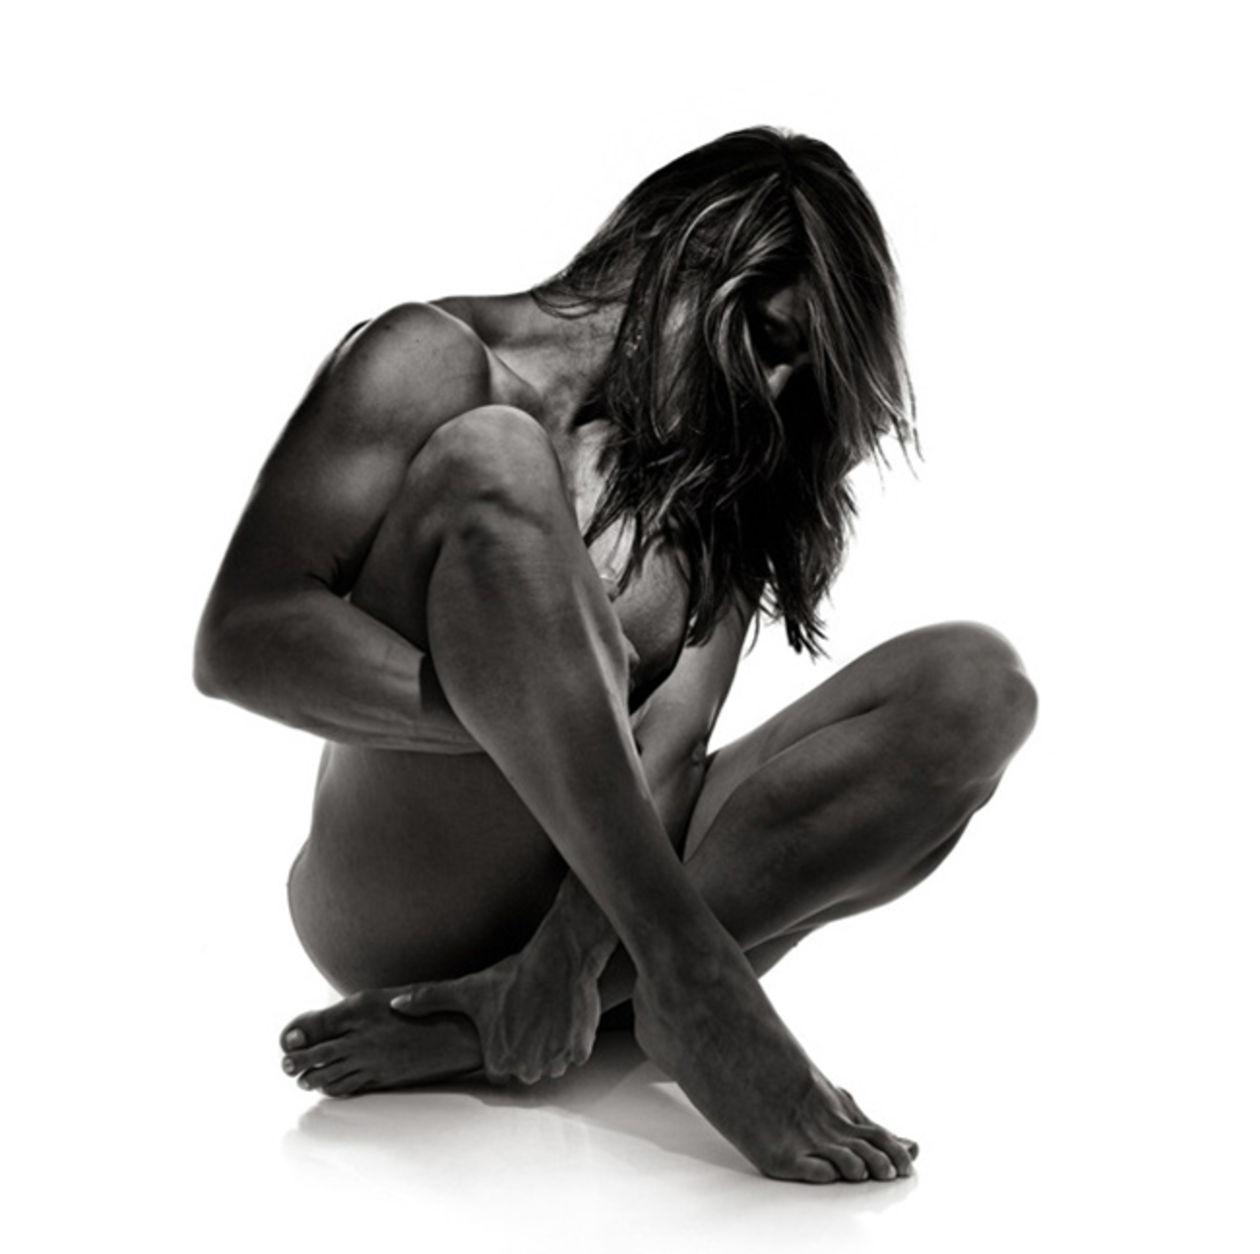 Эротика бодибилдинг женщины 21 фотография